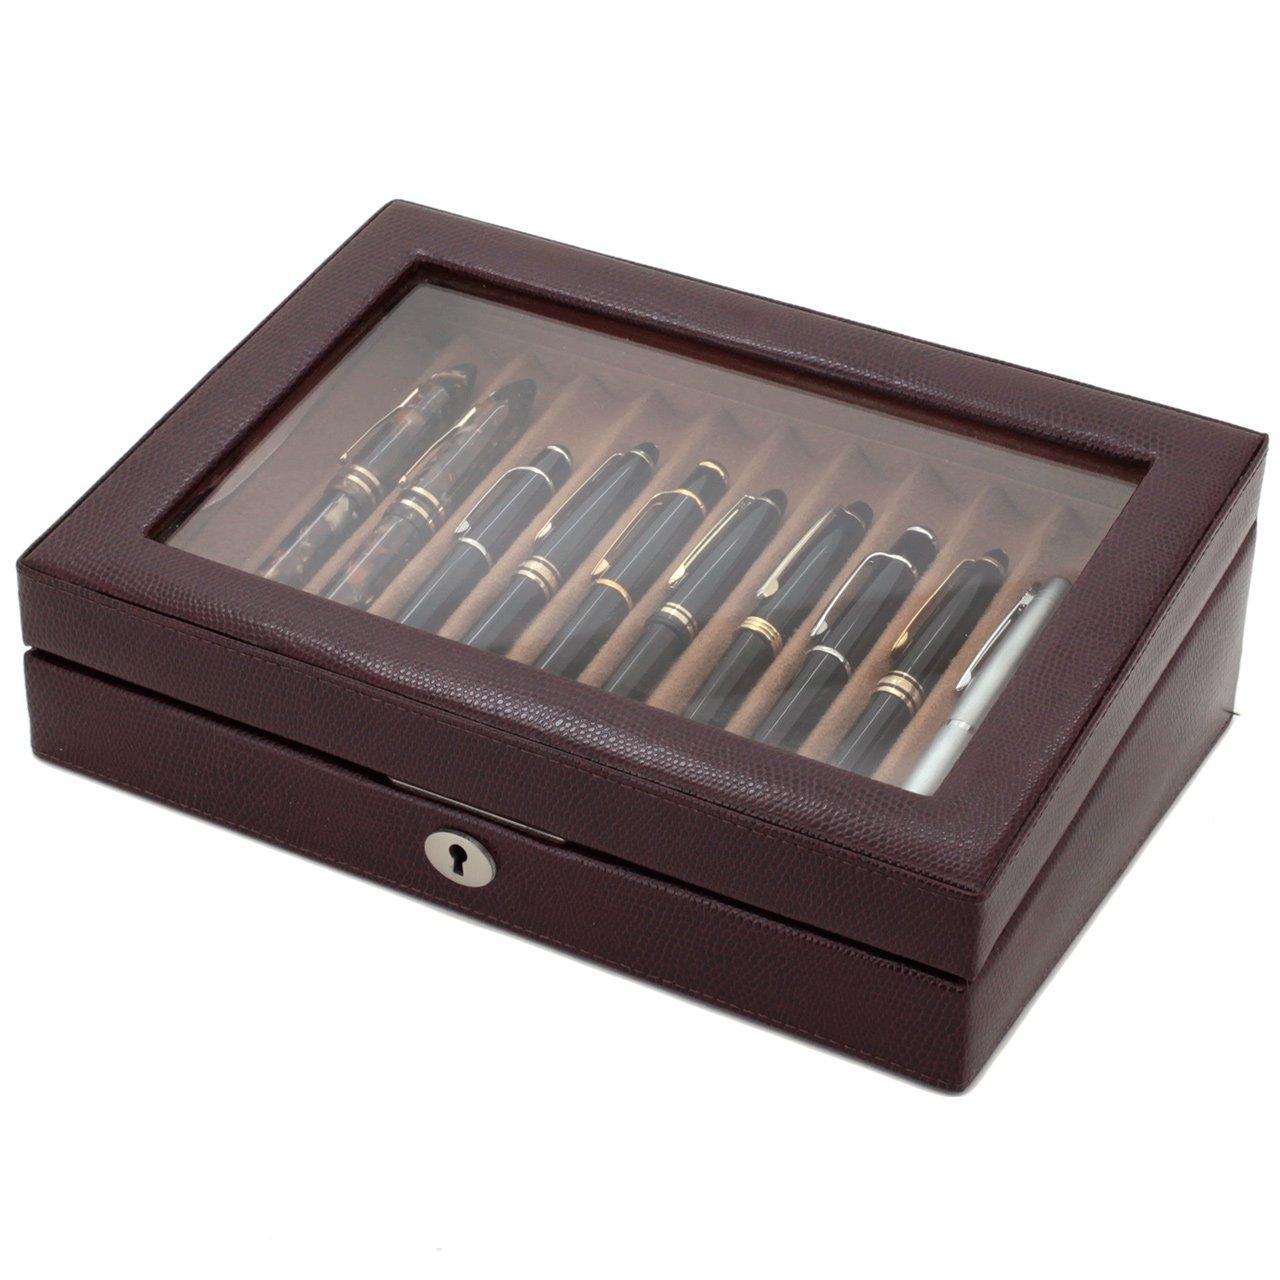 Tech Swiss TS0432BRN- 11 Pen Box Display Storage Brown Leather Glass Lid Lock by Tech Swiss